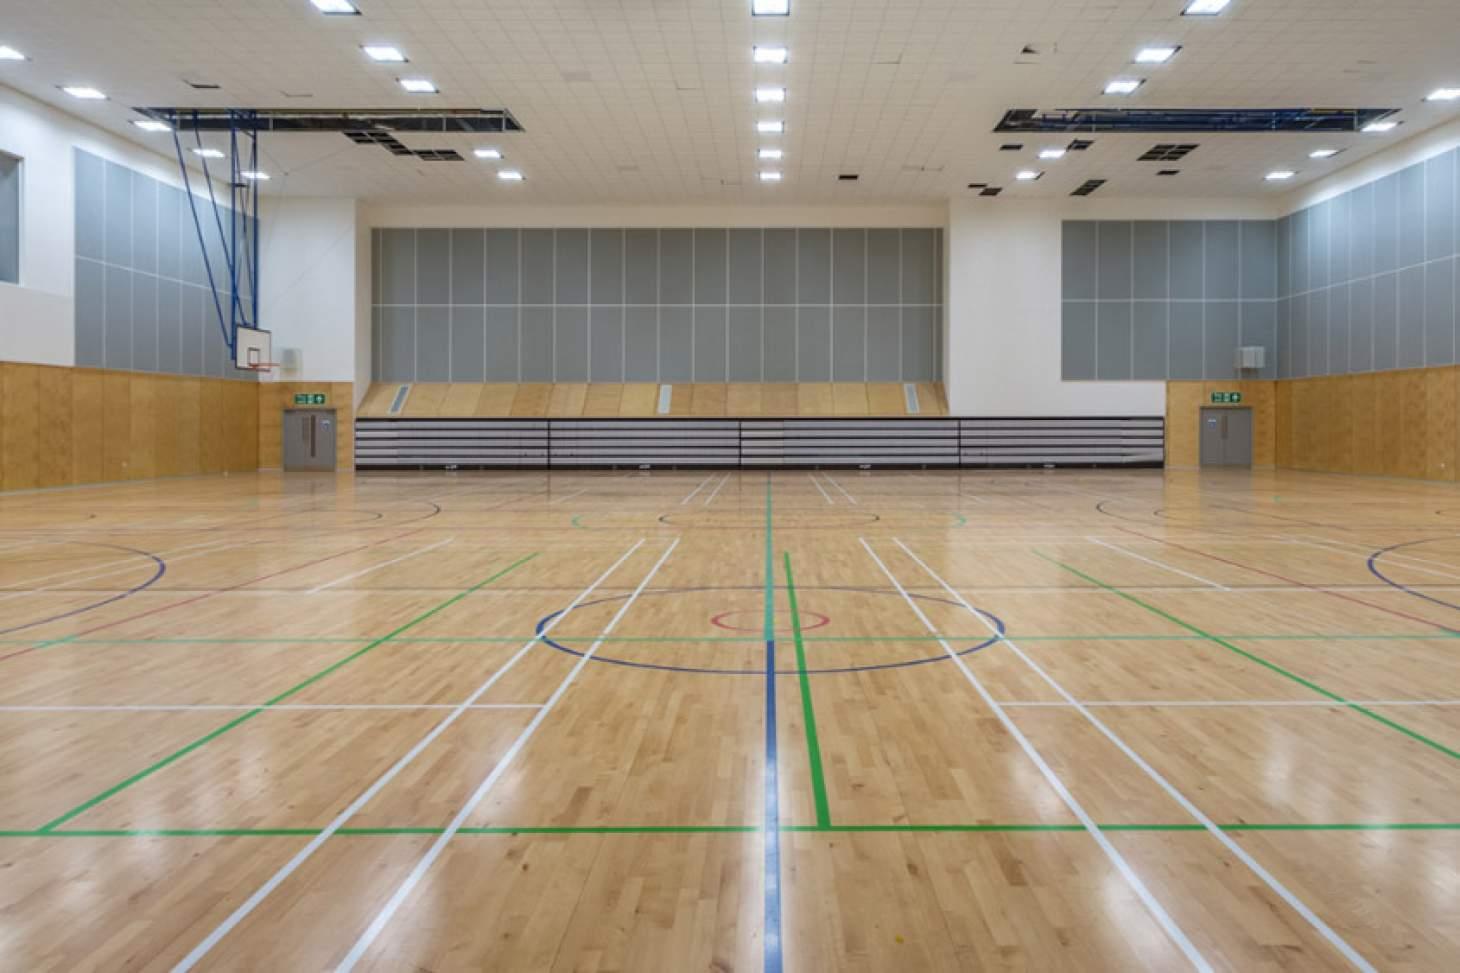 Kensington Leisure Centre Table | Hard table tennis table